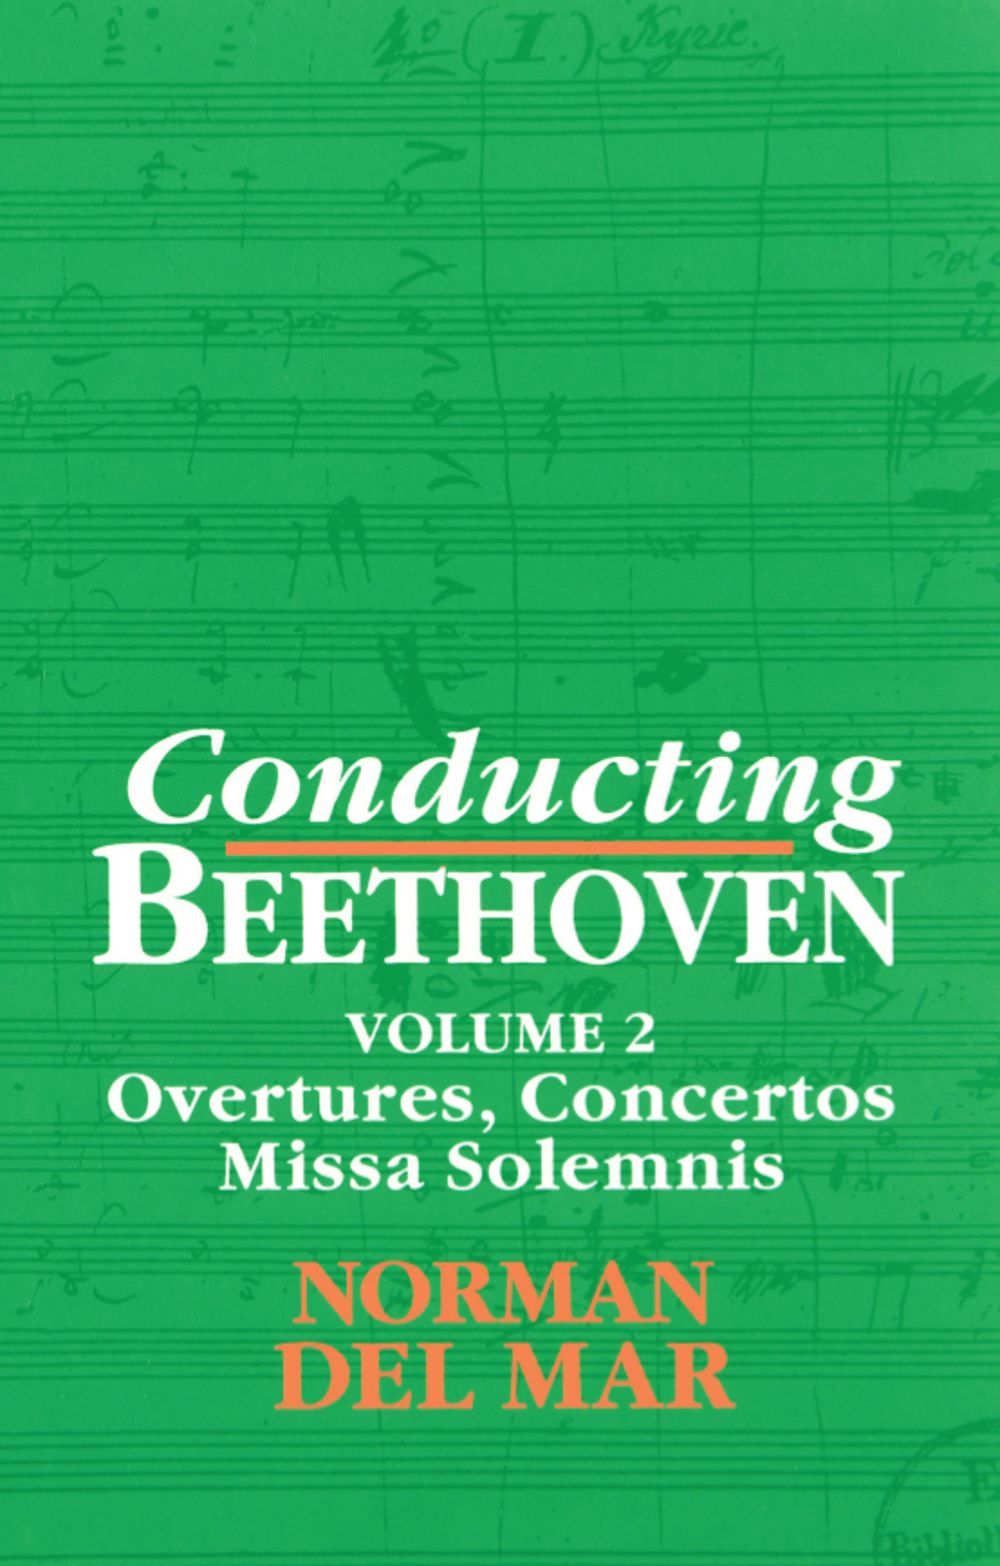 Conducting Beethoven: Volume 2